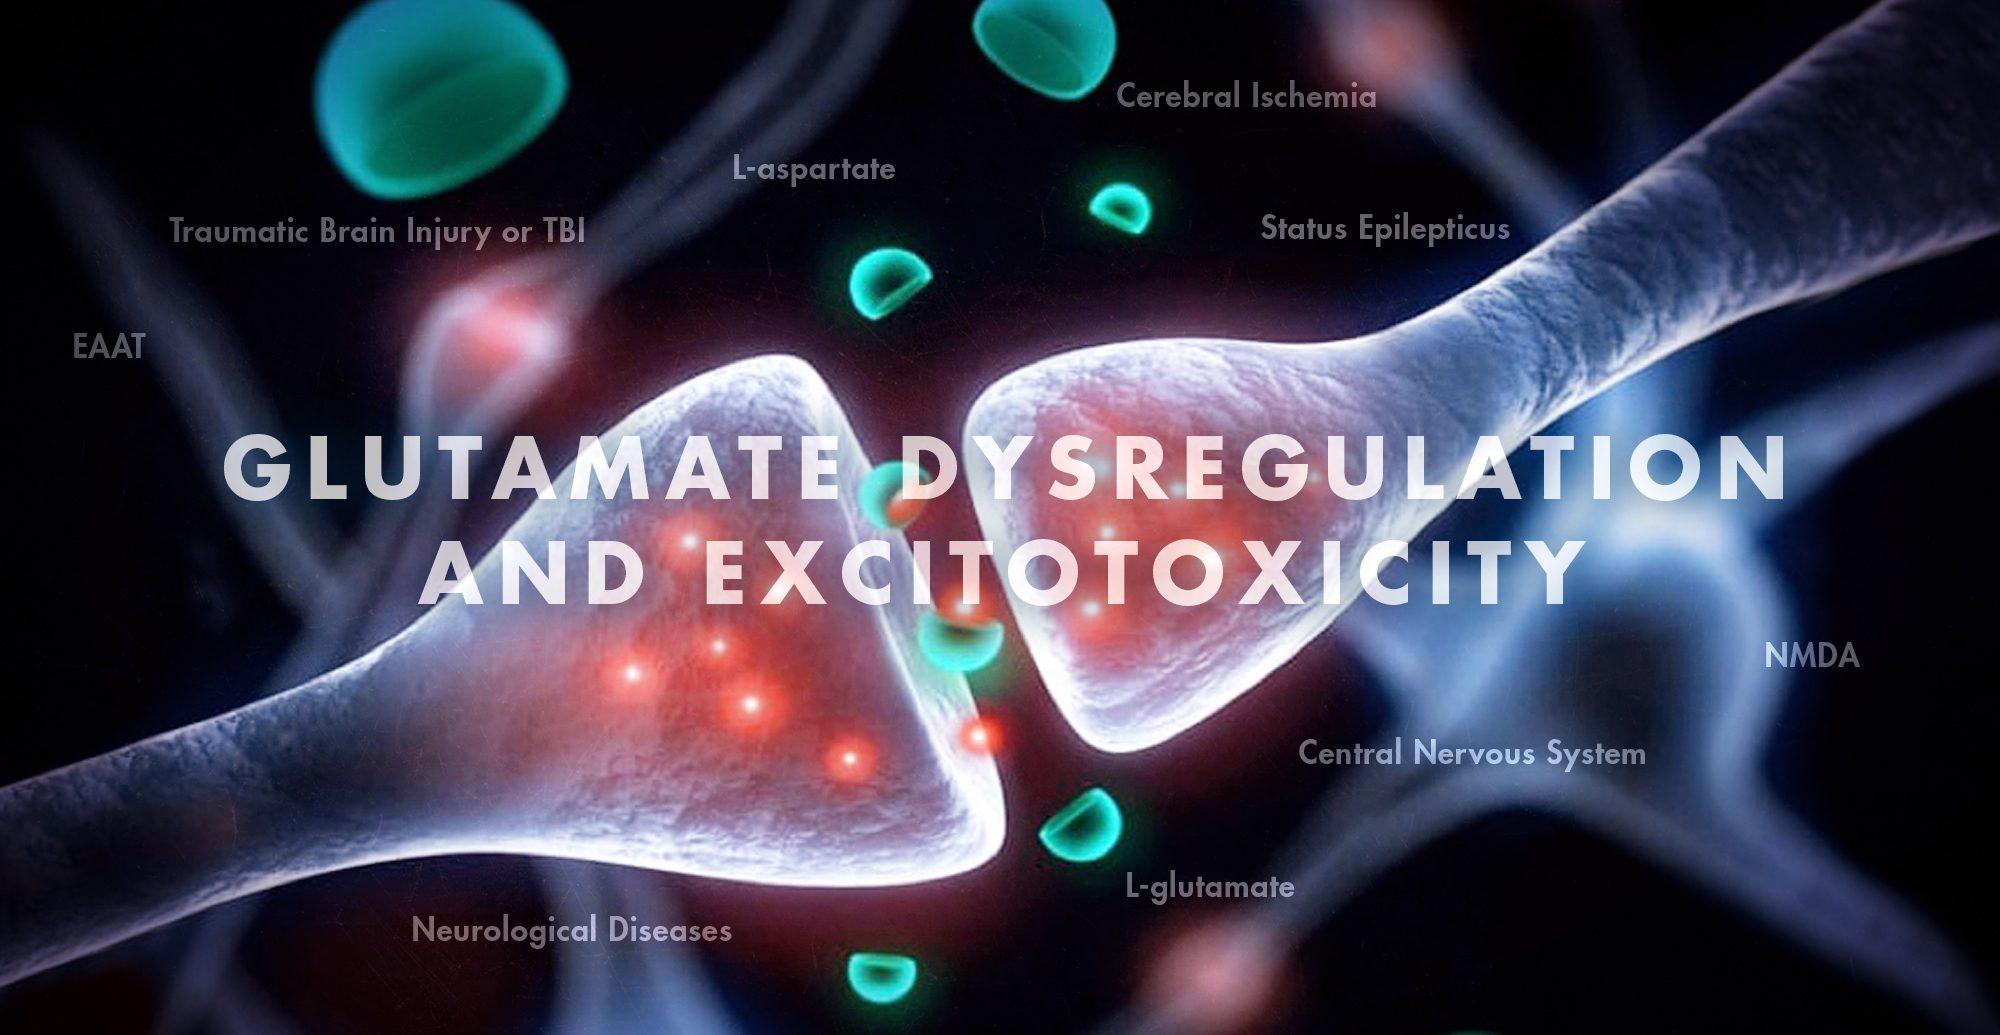 Glutamate Dysregulation and Excitotoxicity | El Paso, TX Chiropractor